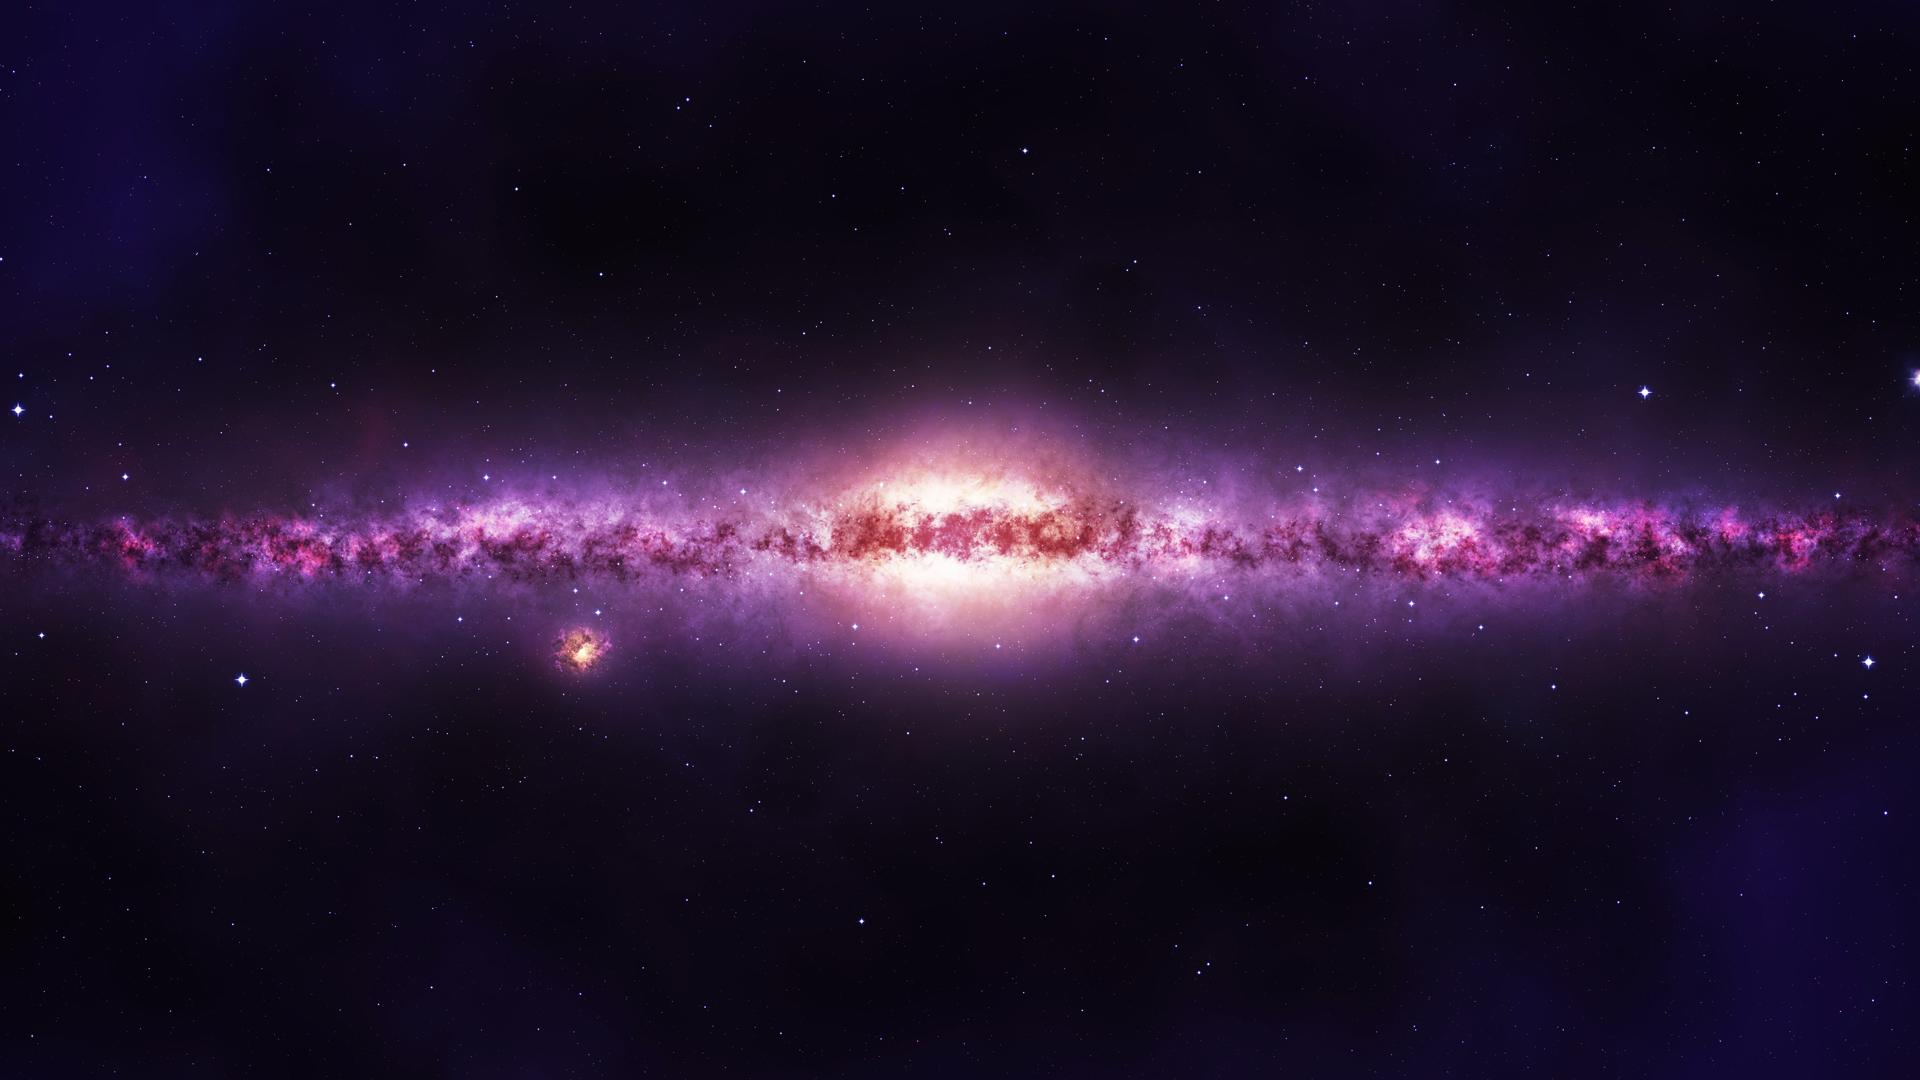 galaxy space purple - photo #9